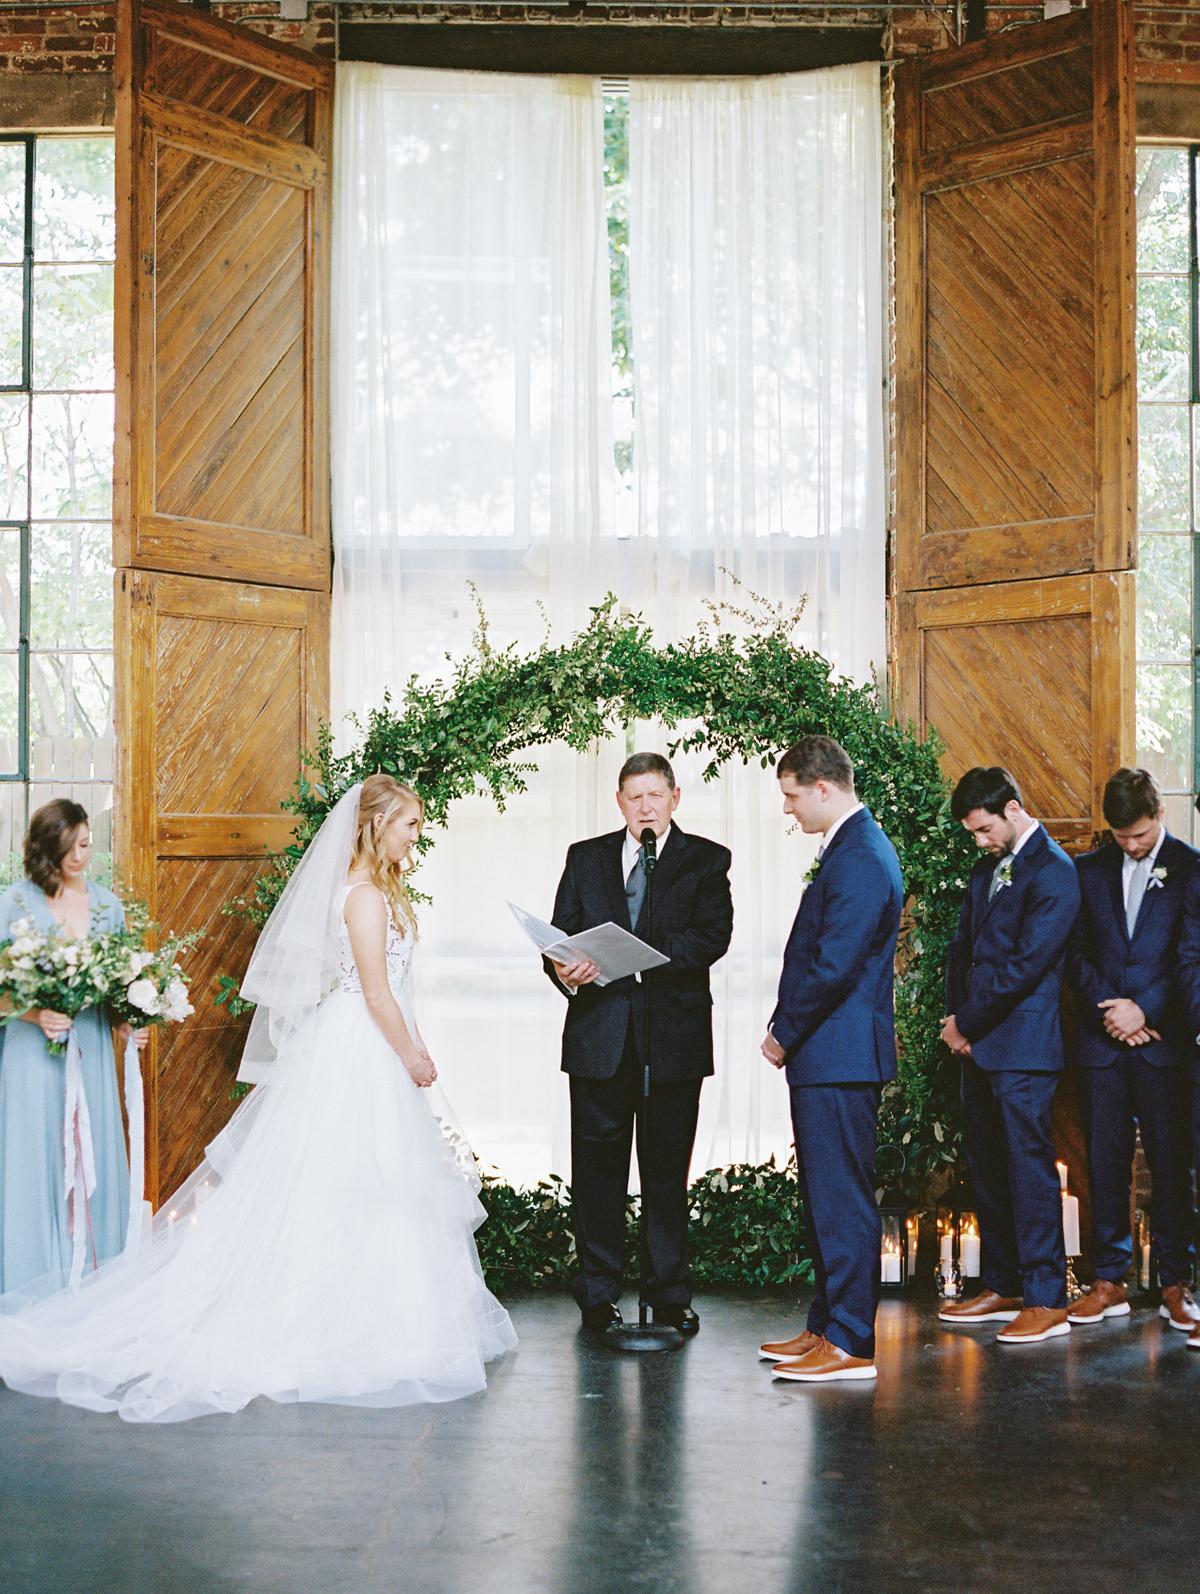 Foundry-At-Puritan-Mill-wedding-photos-venue-atlanta-fine-art-film-photographer40.JPG